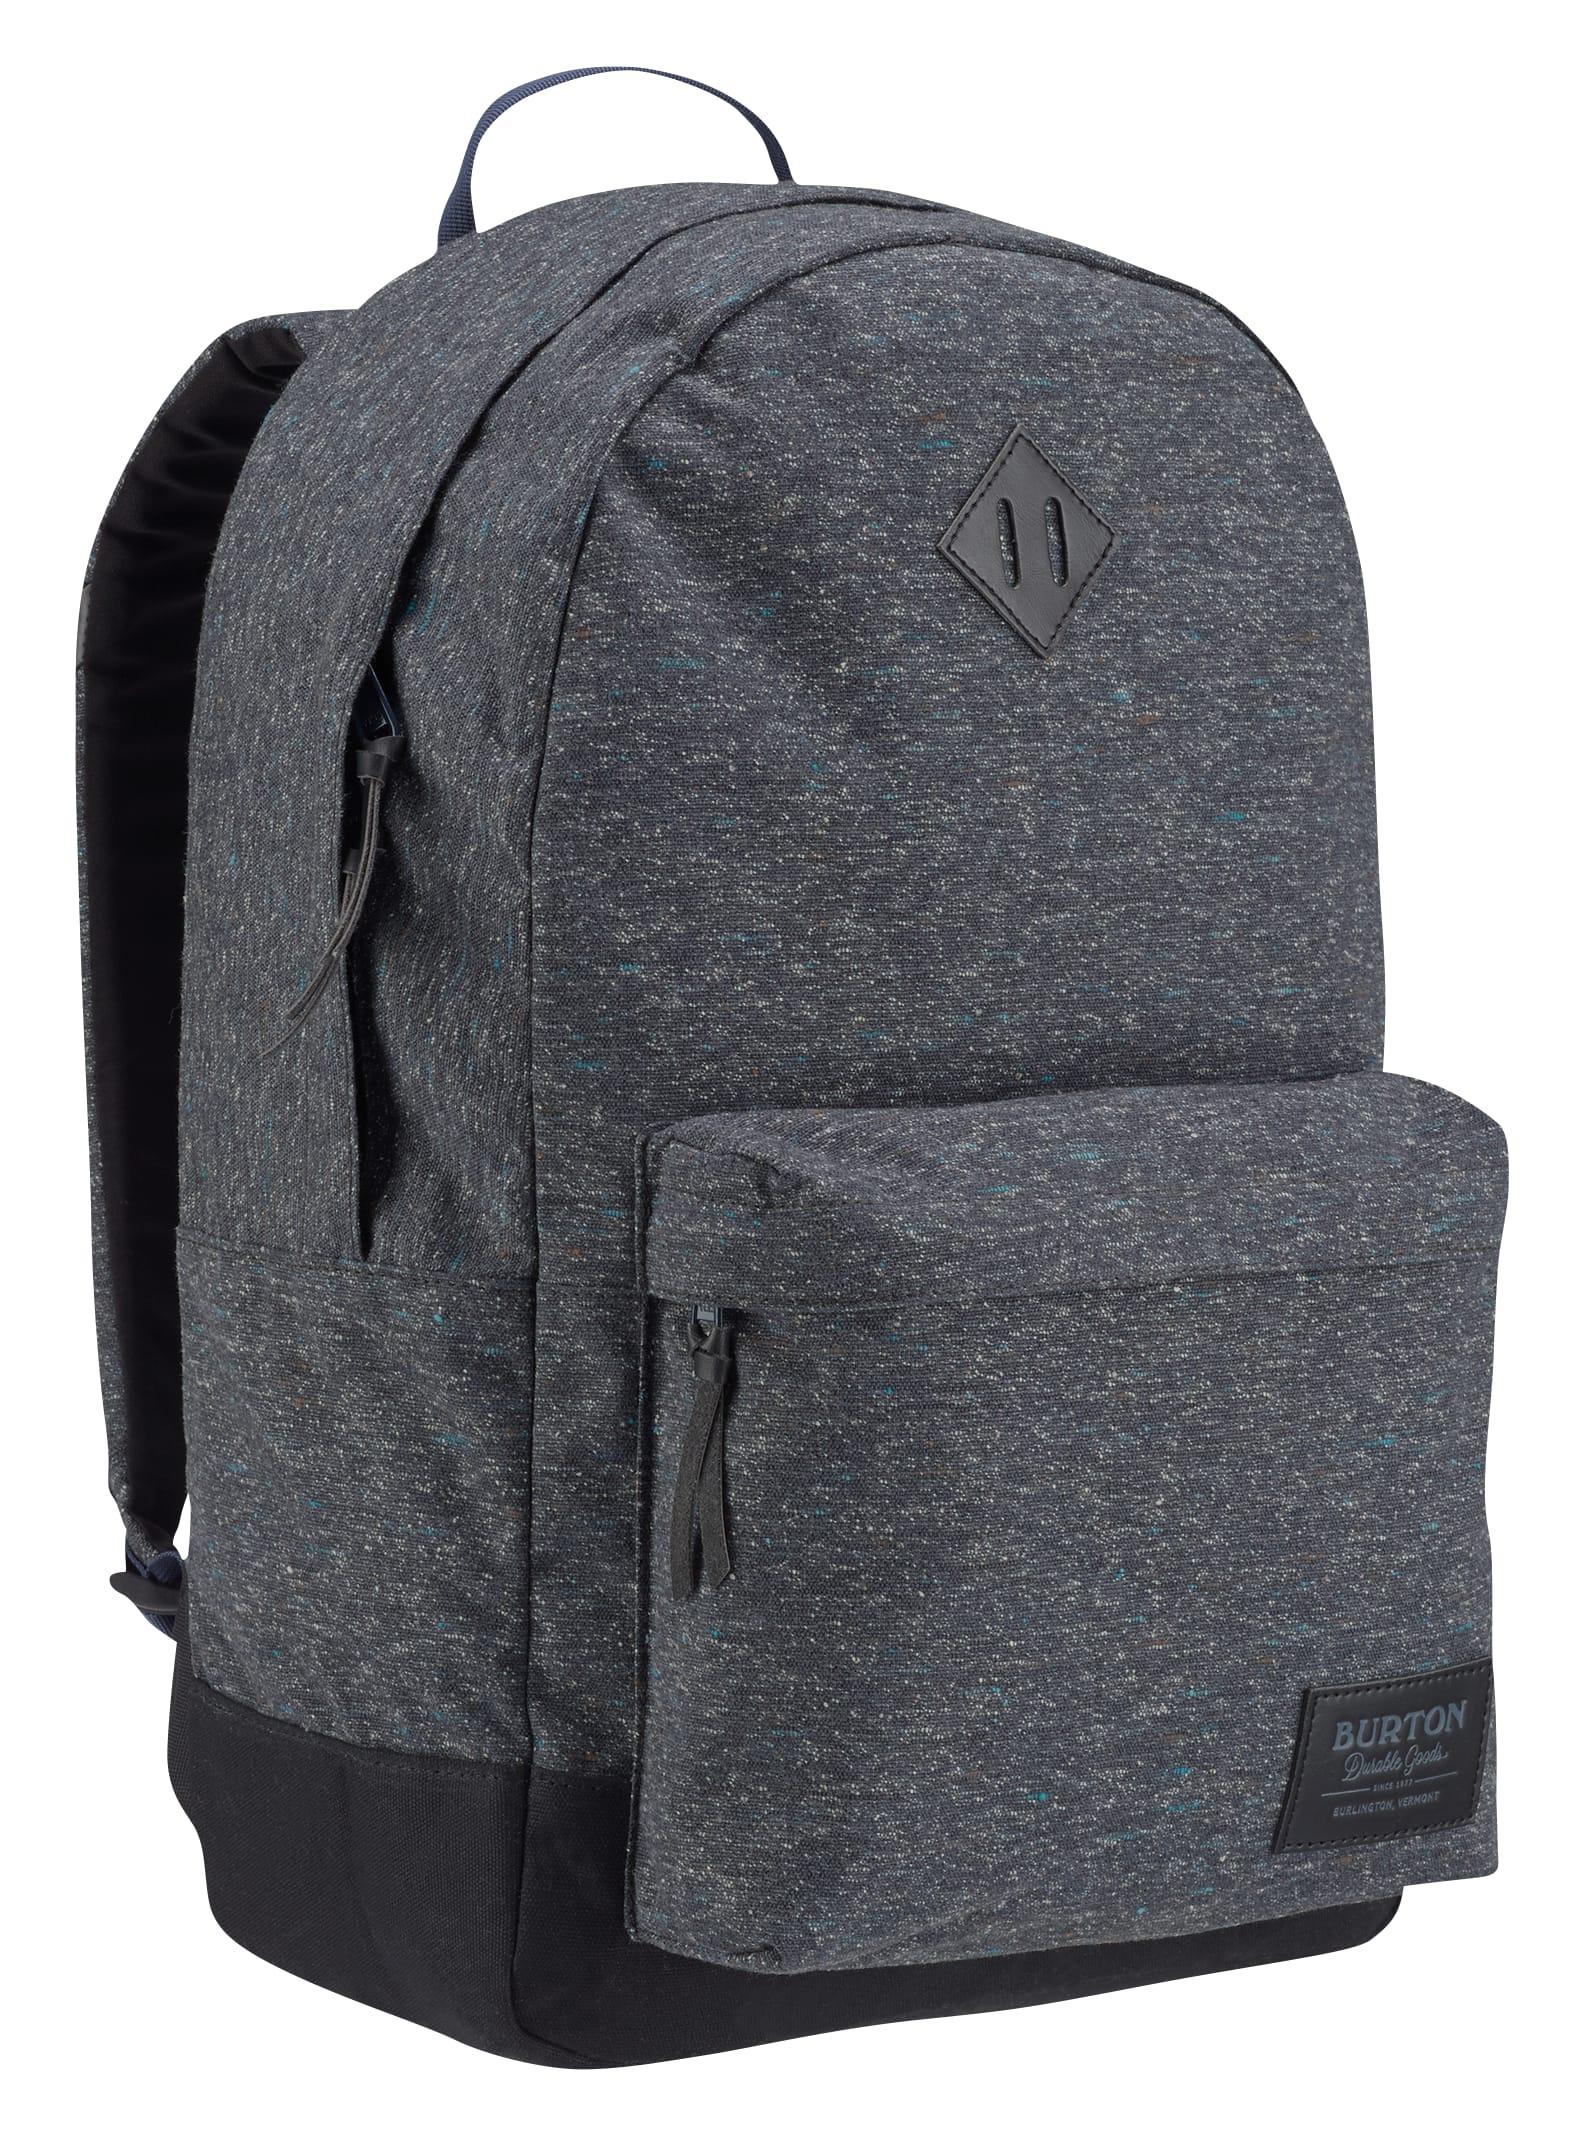 Рюкзак burton metalhead pack majestic black plaid na слинго рюкзаки yamo